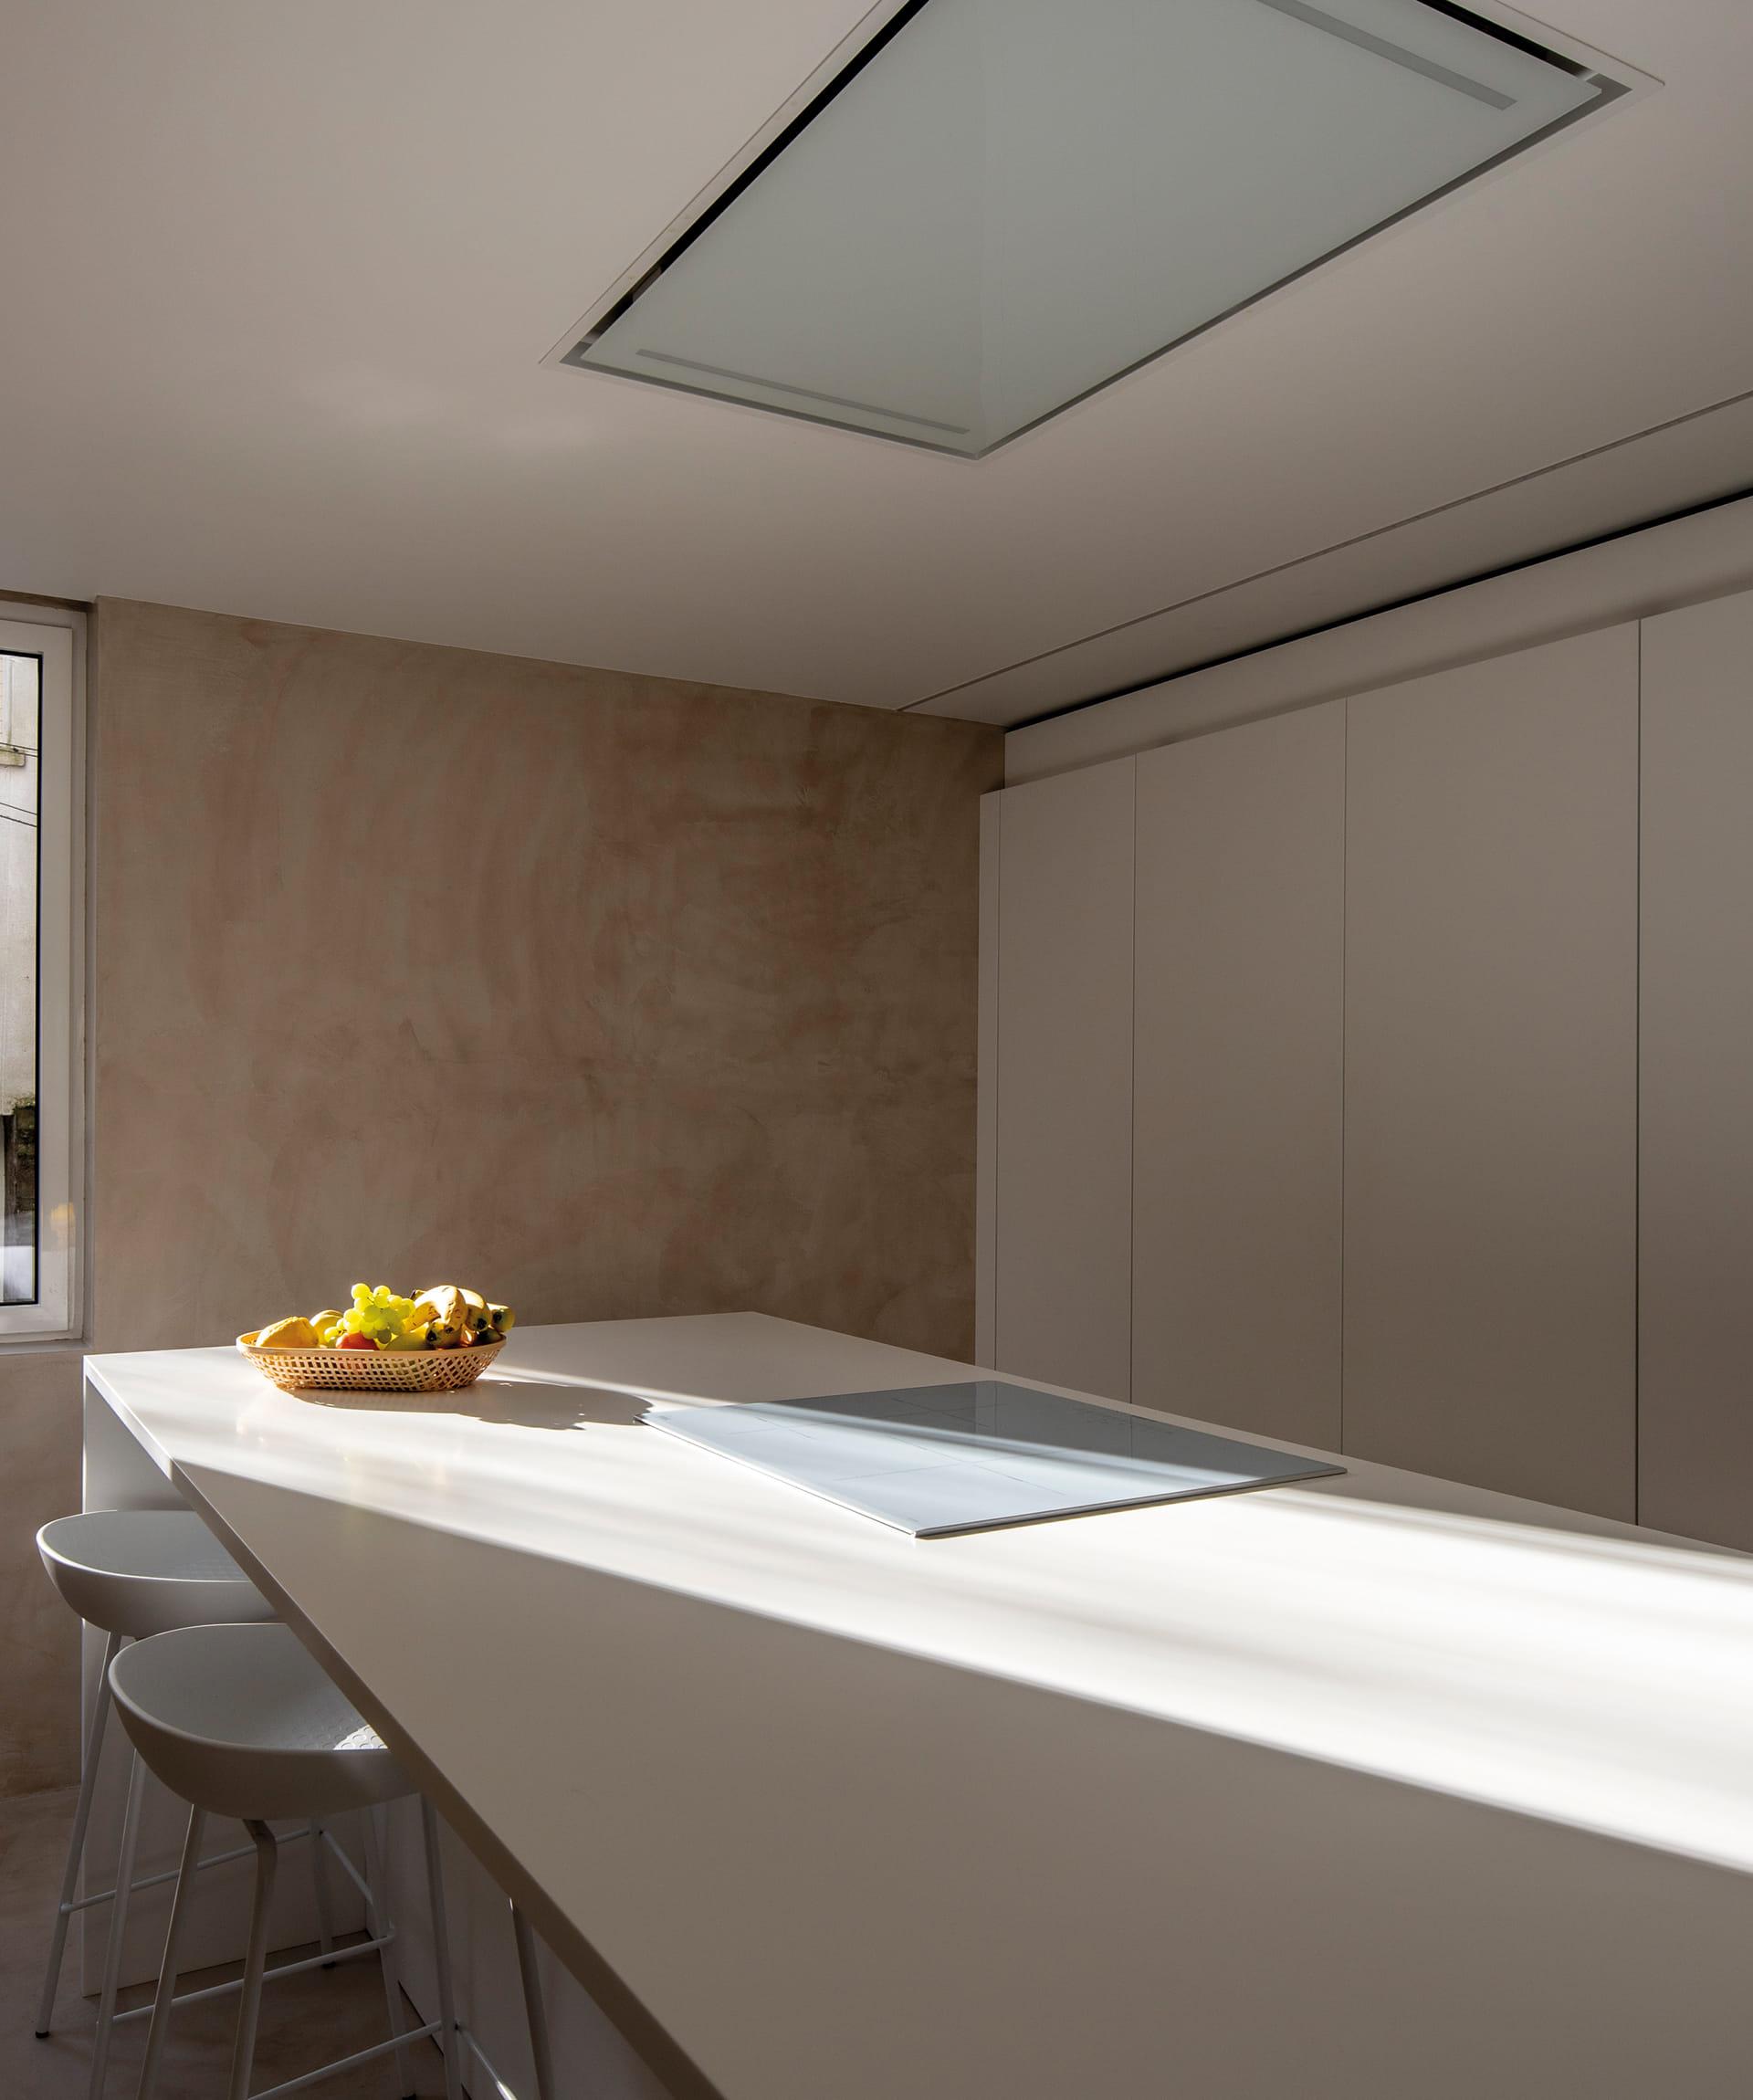 Wit werkblad keuken met eiland